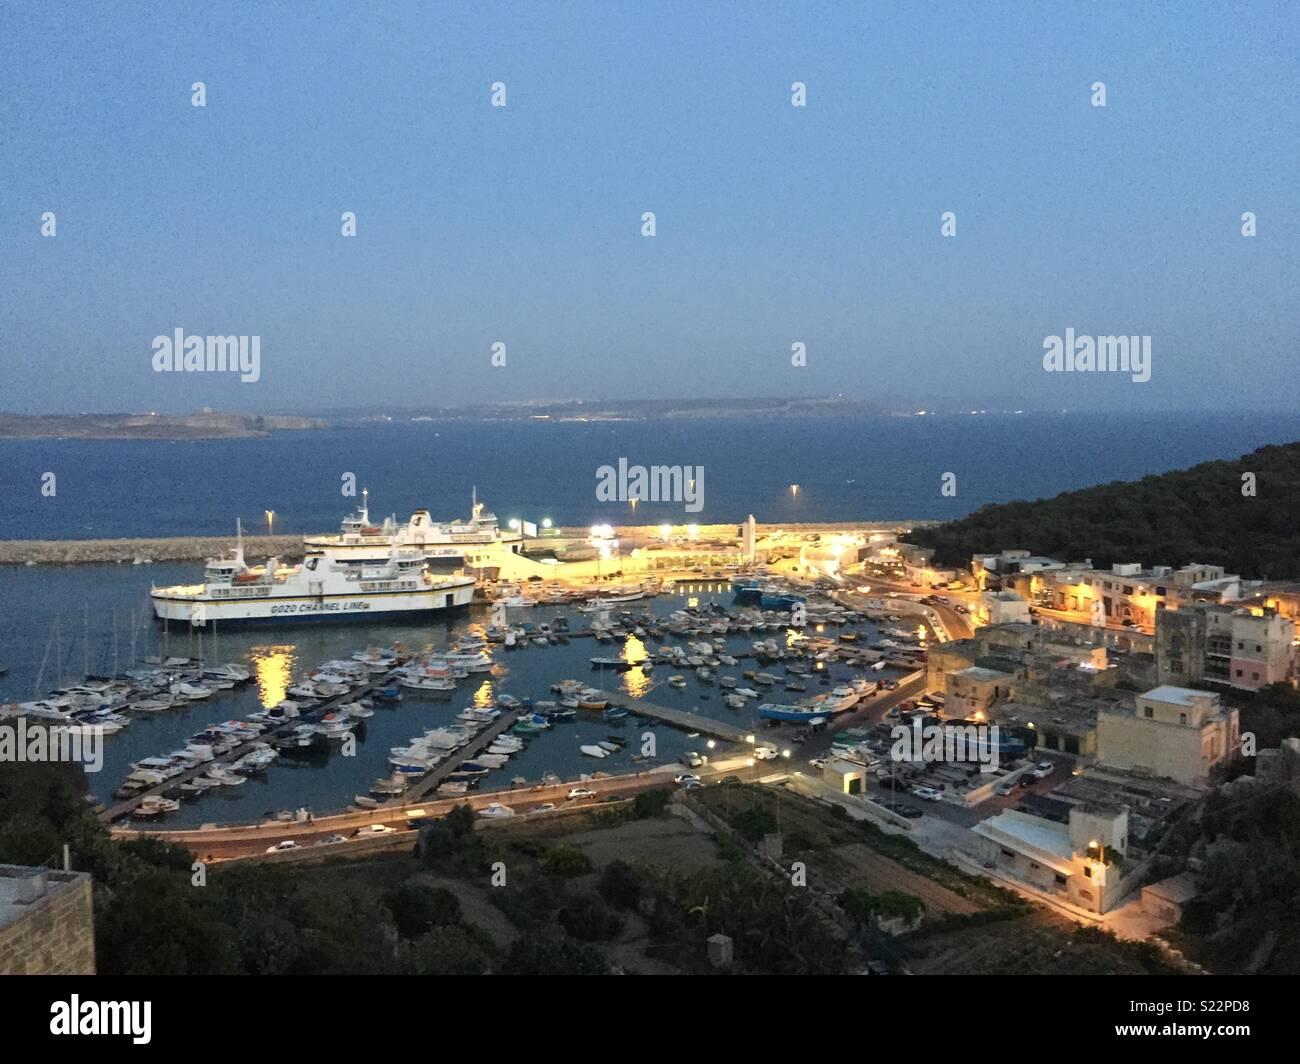 Gozo Harbour Dusk View - Stock Image